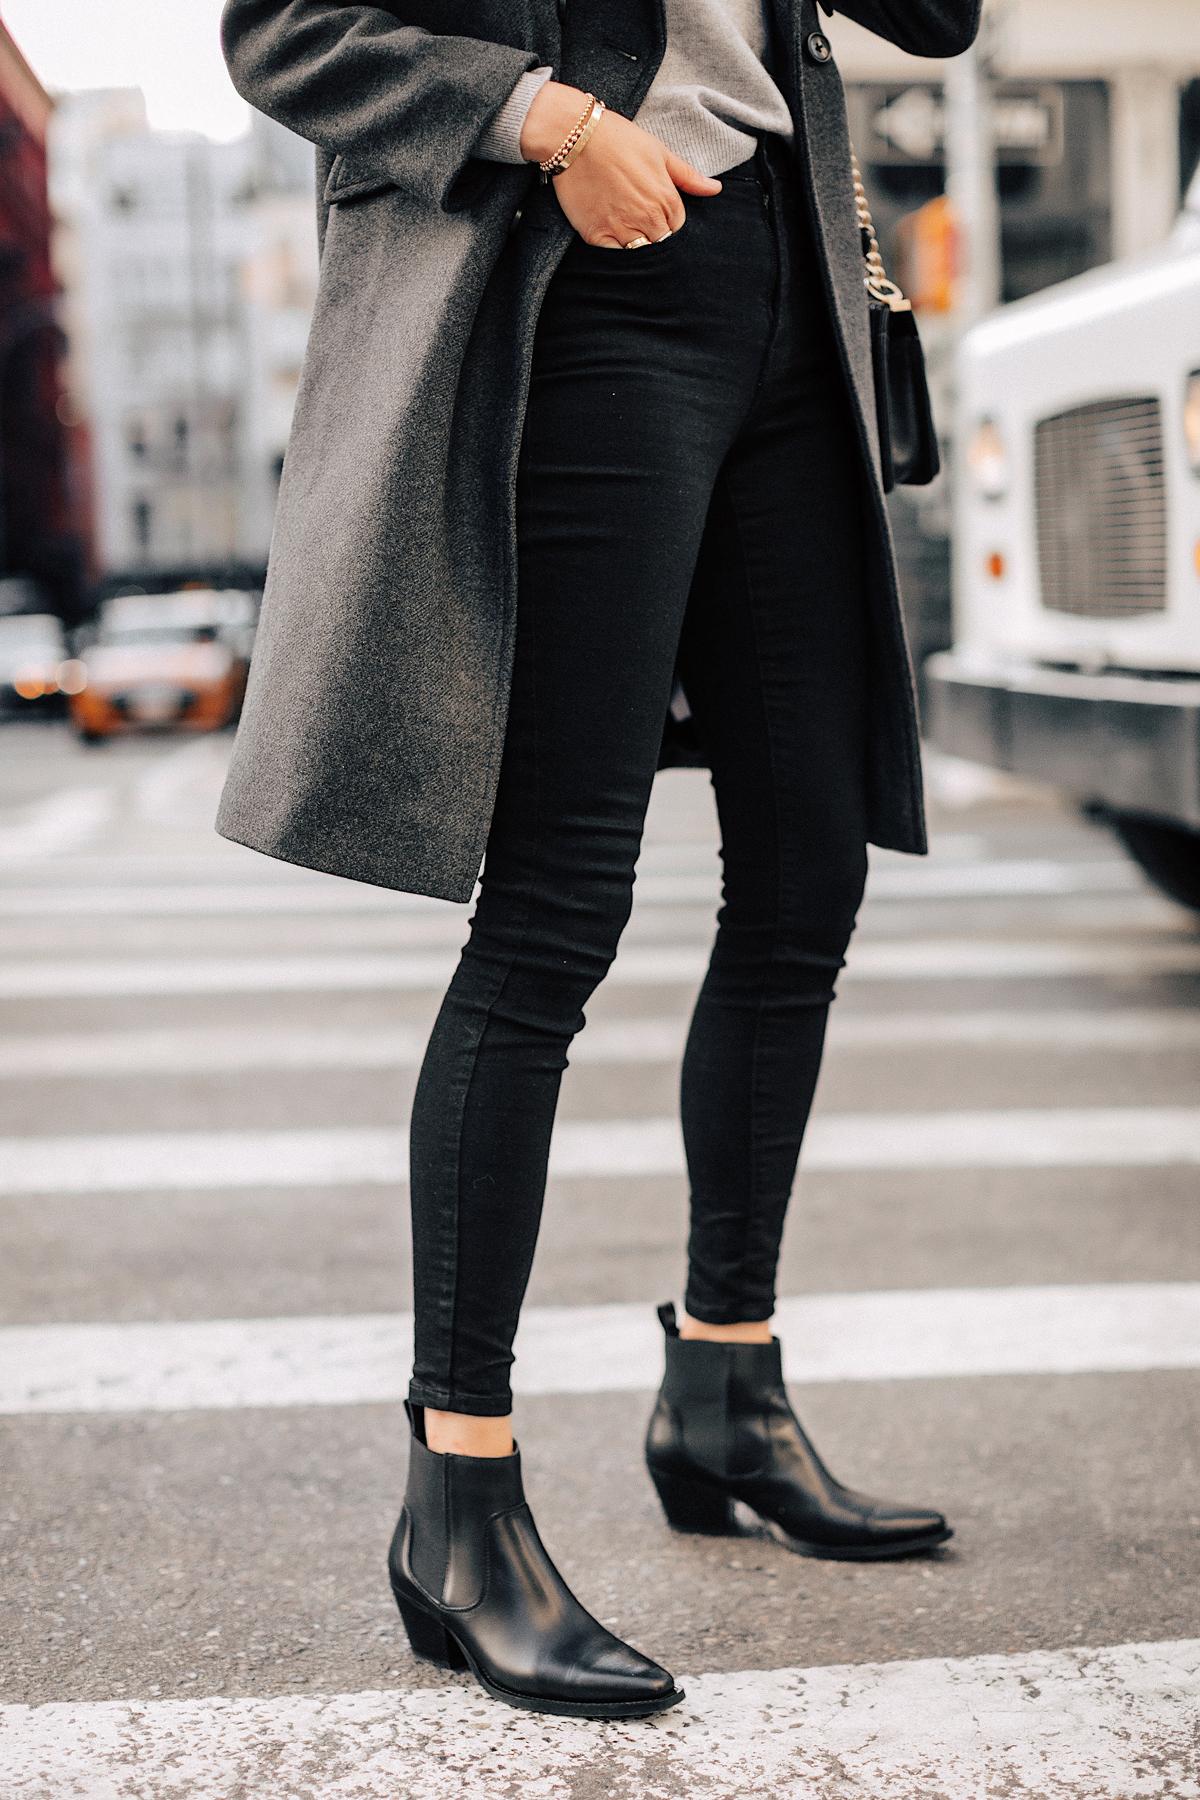 Fashion Jackson Wearing Everlane Black Skinny Jeans Everlane Black Booties